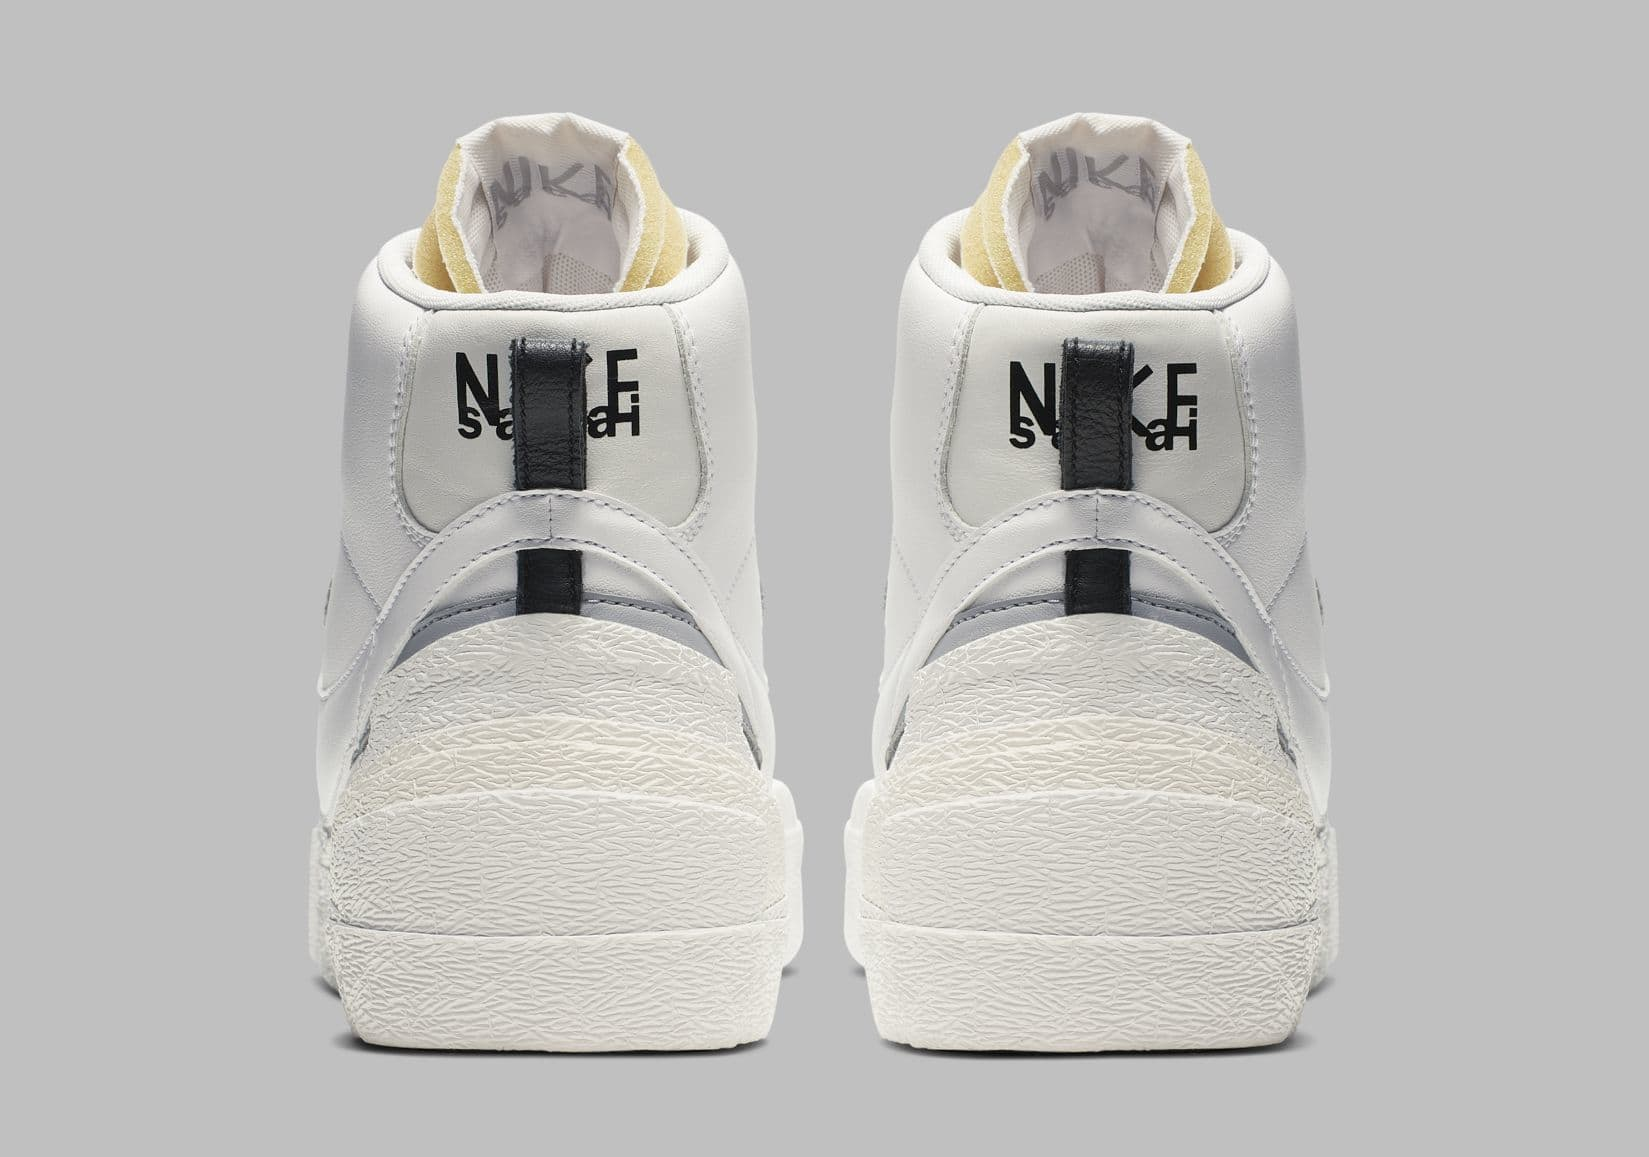 sacai-nike-blazer-mid-white-bv0072-100-heel